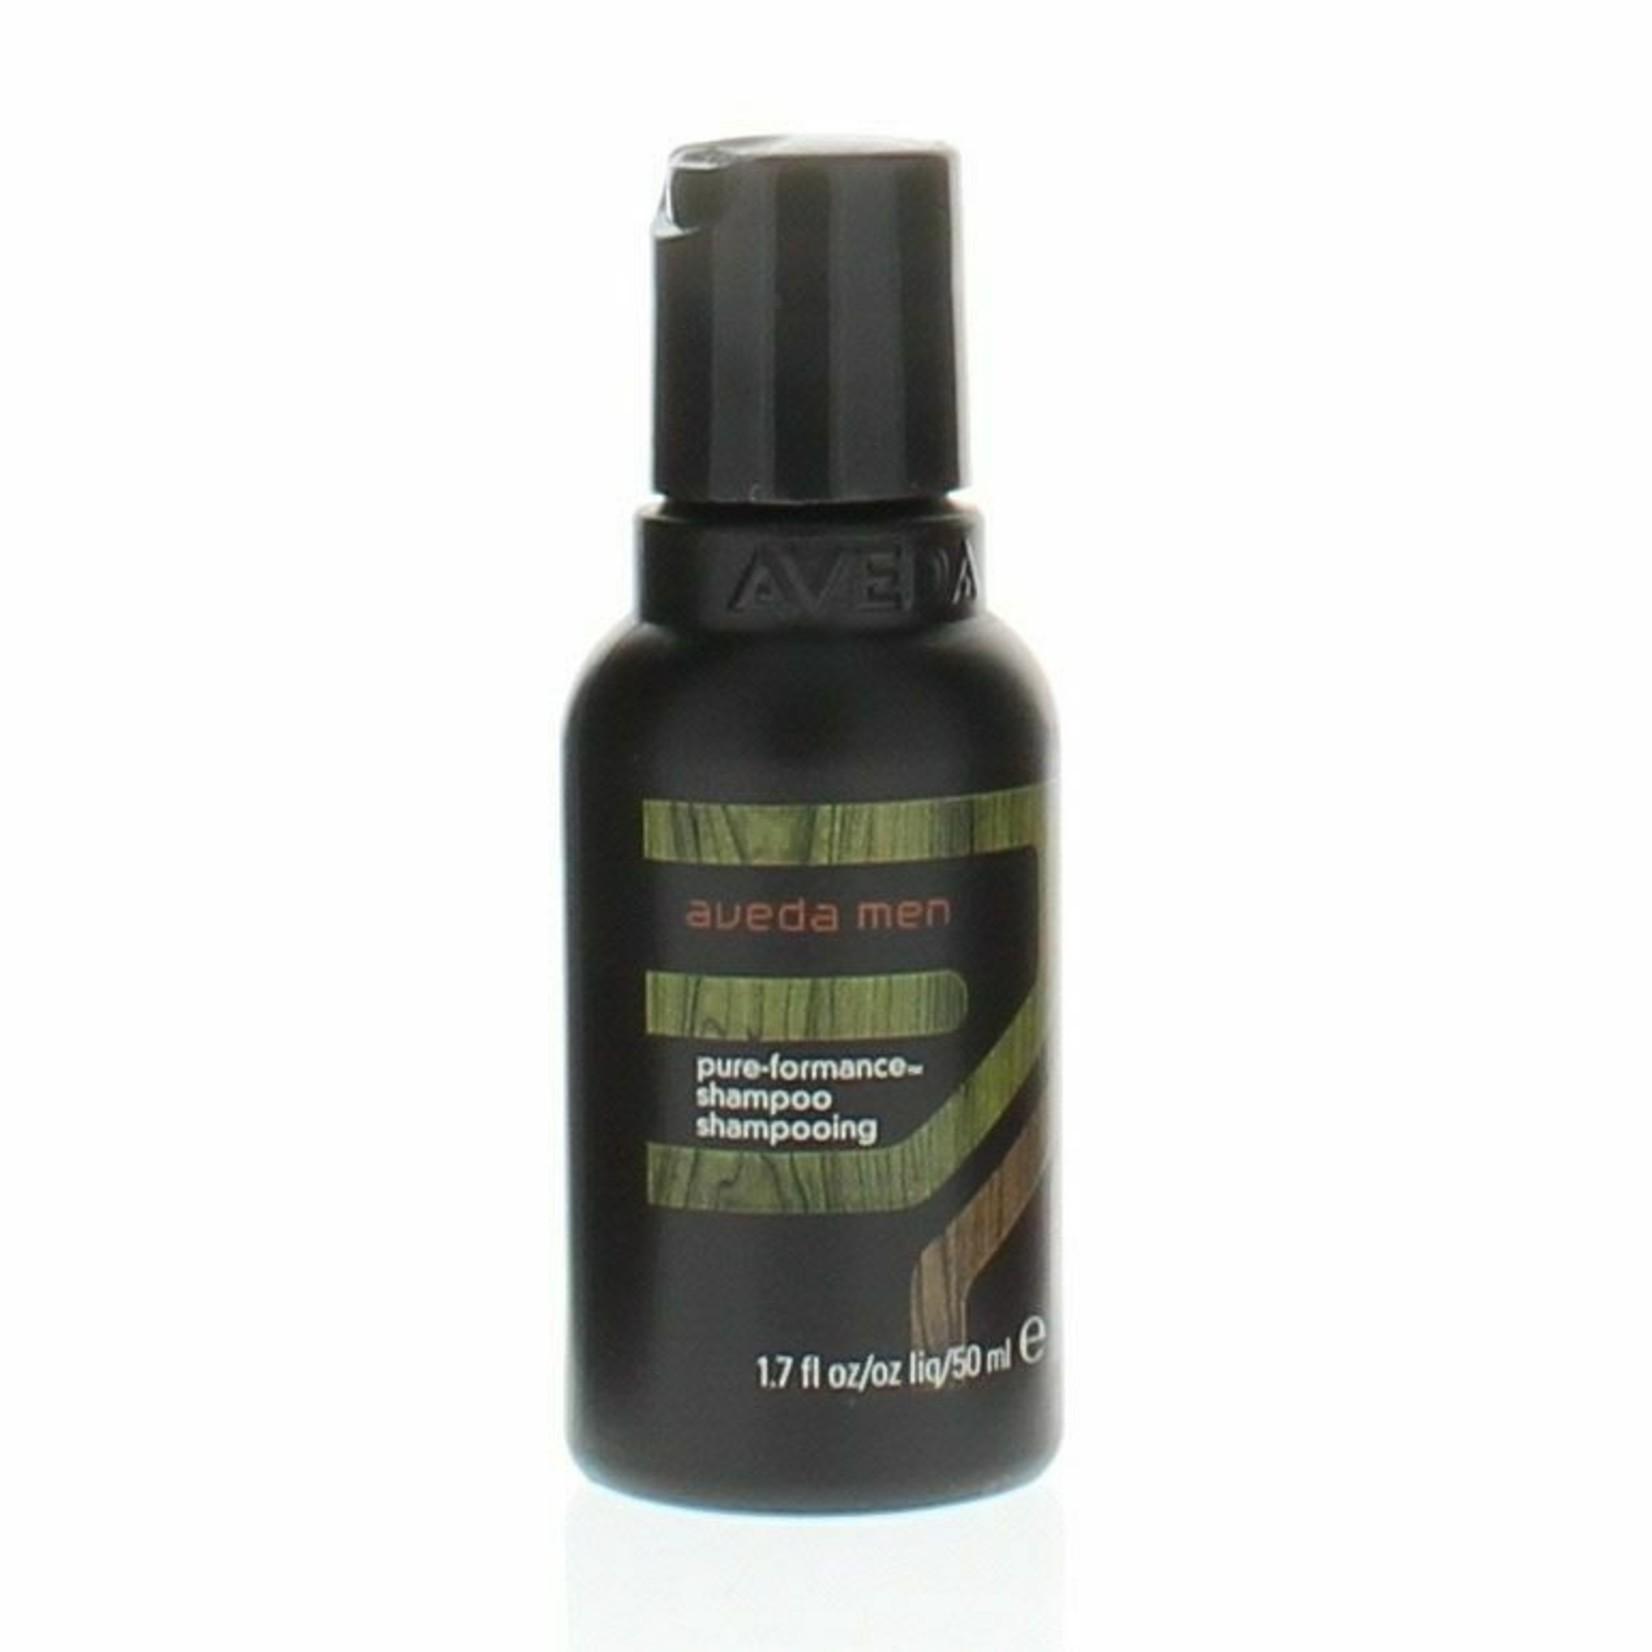 AVEDA Aveda Men Pure-Formance™ Shampoo